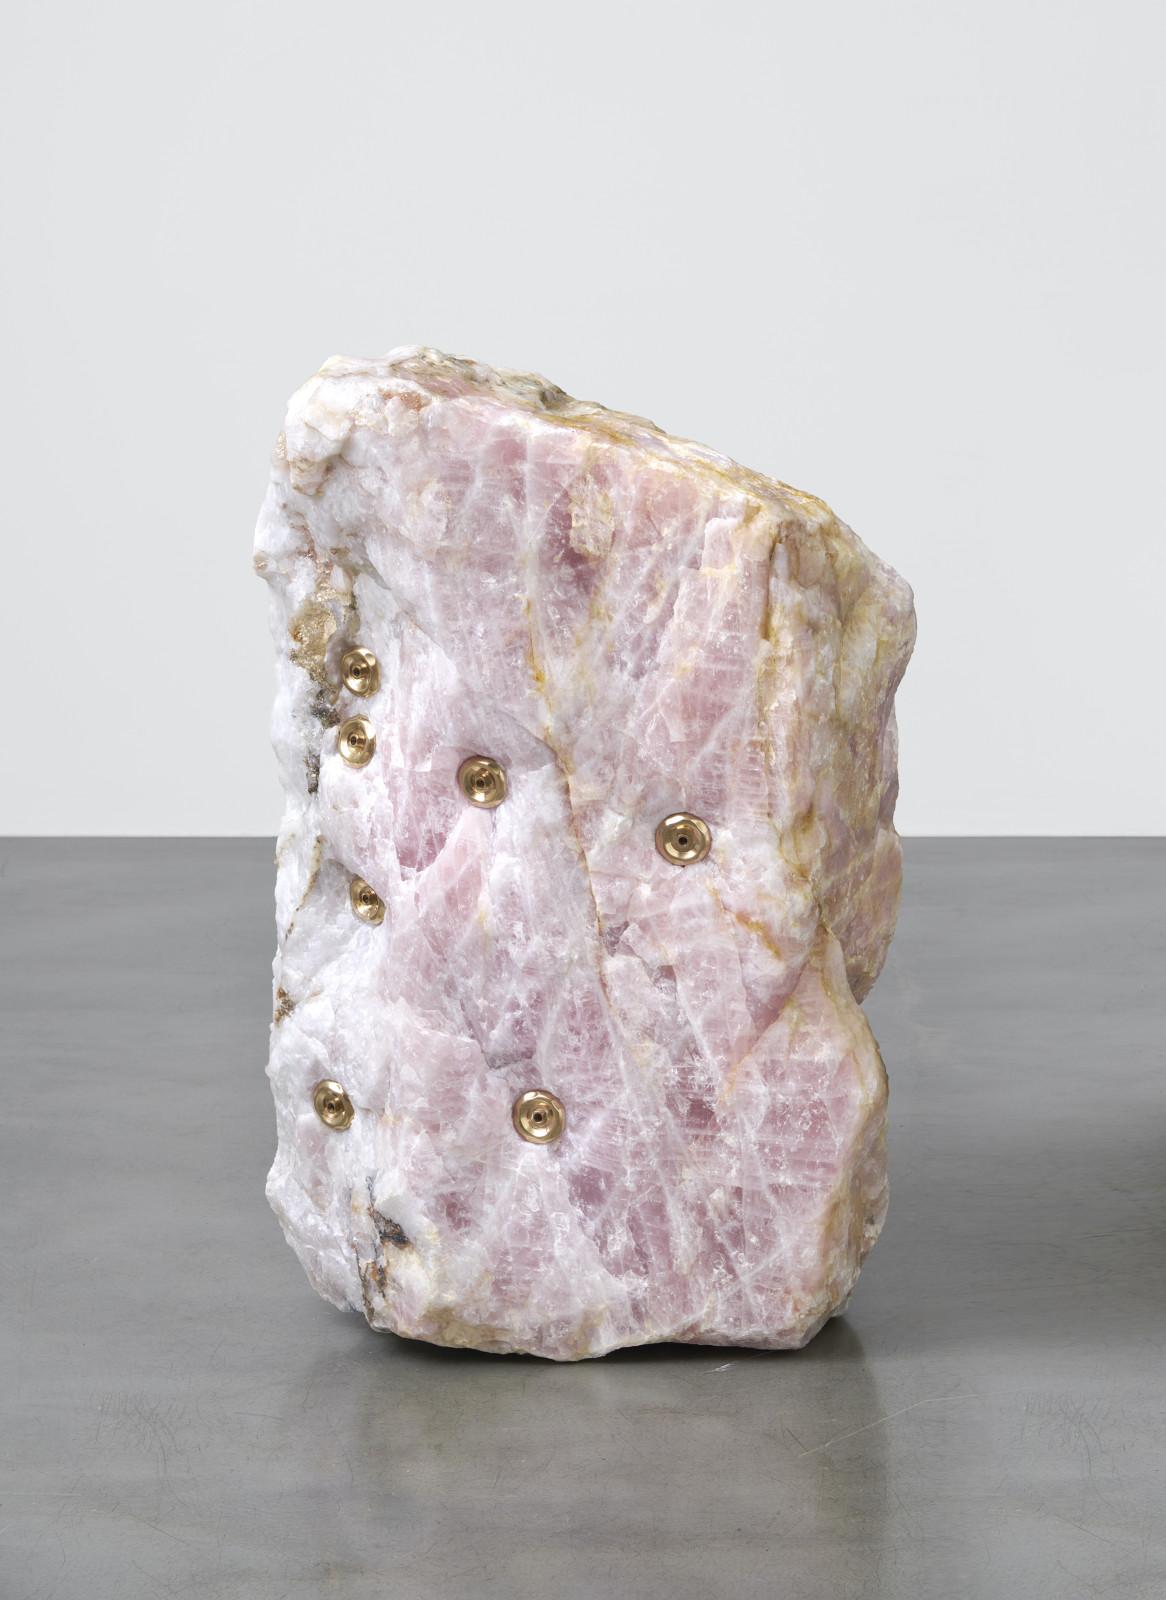 Mika Tajima, Pranayama (Monlith, E, Rose Quartz), 2020. Courtesy the artist, Kanye Griffin Corcoran and Simon Lee Gallery